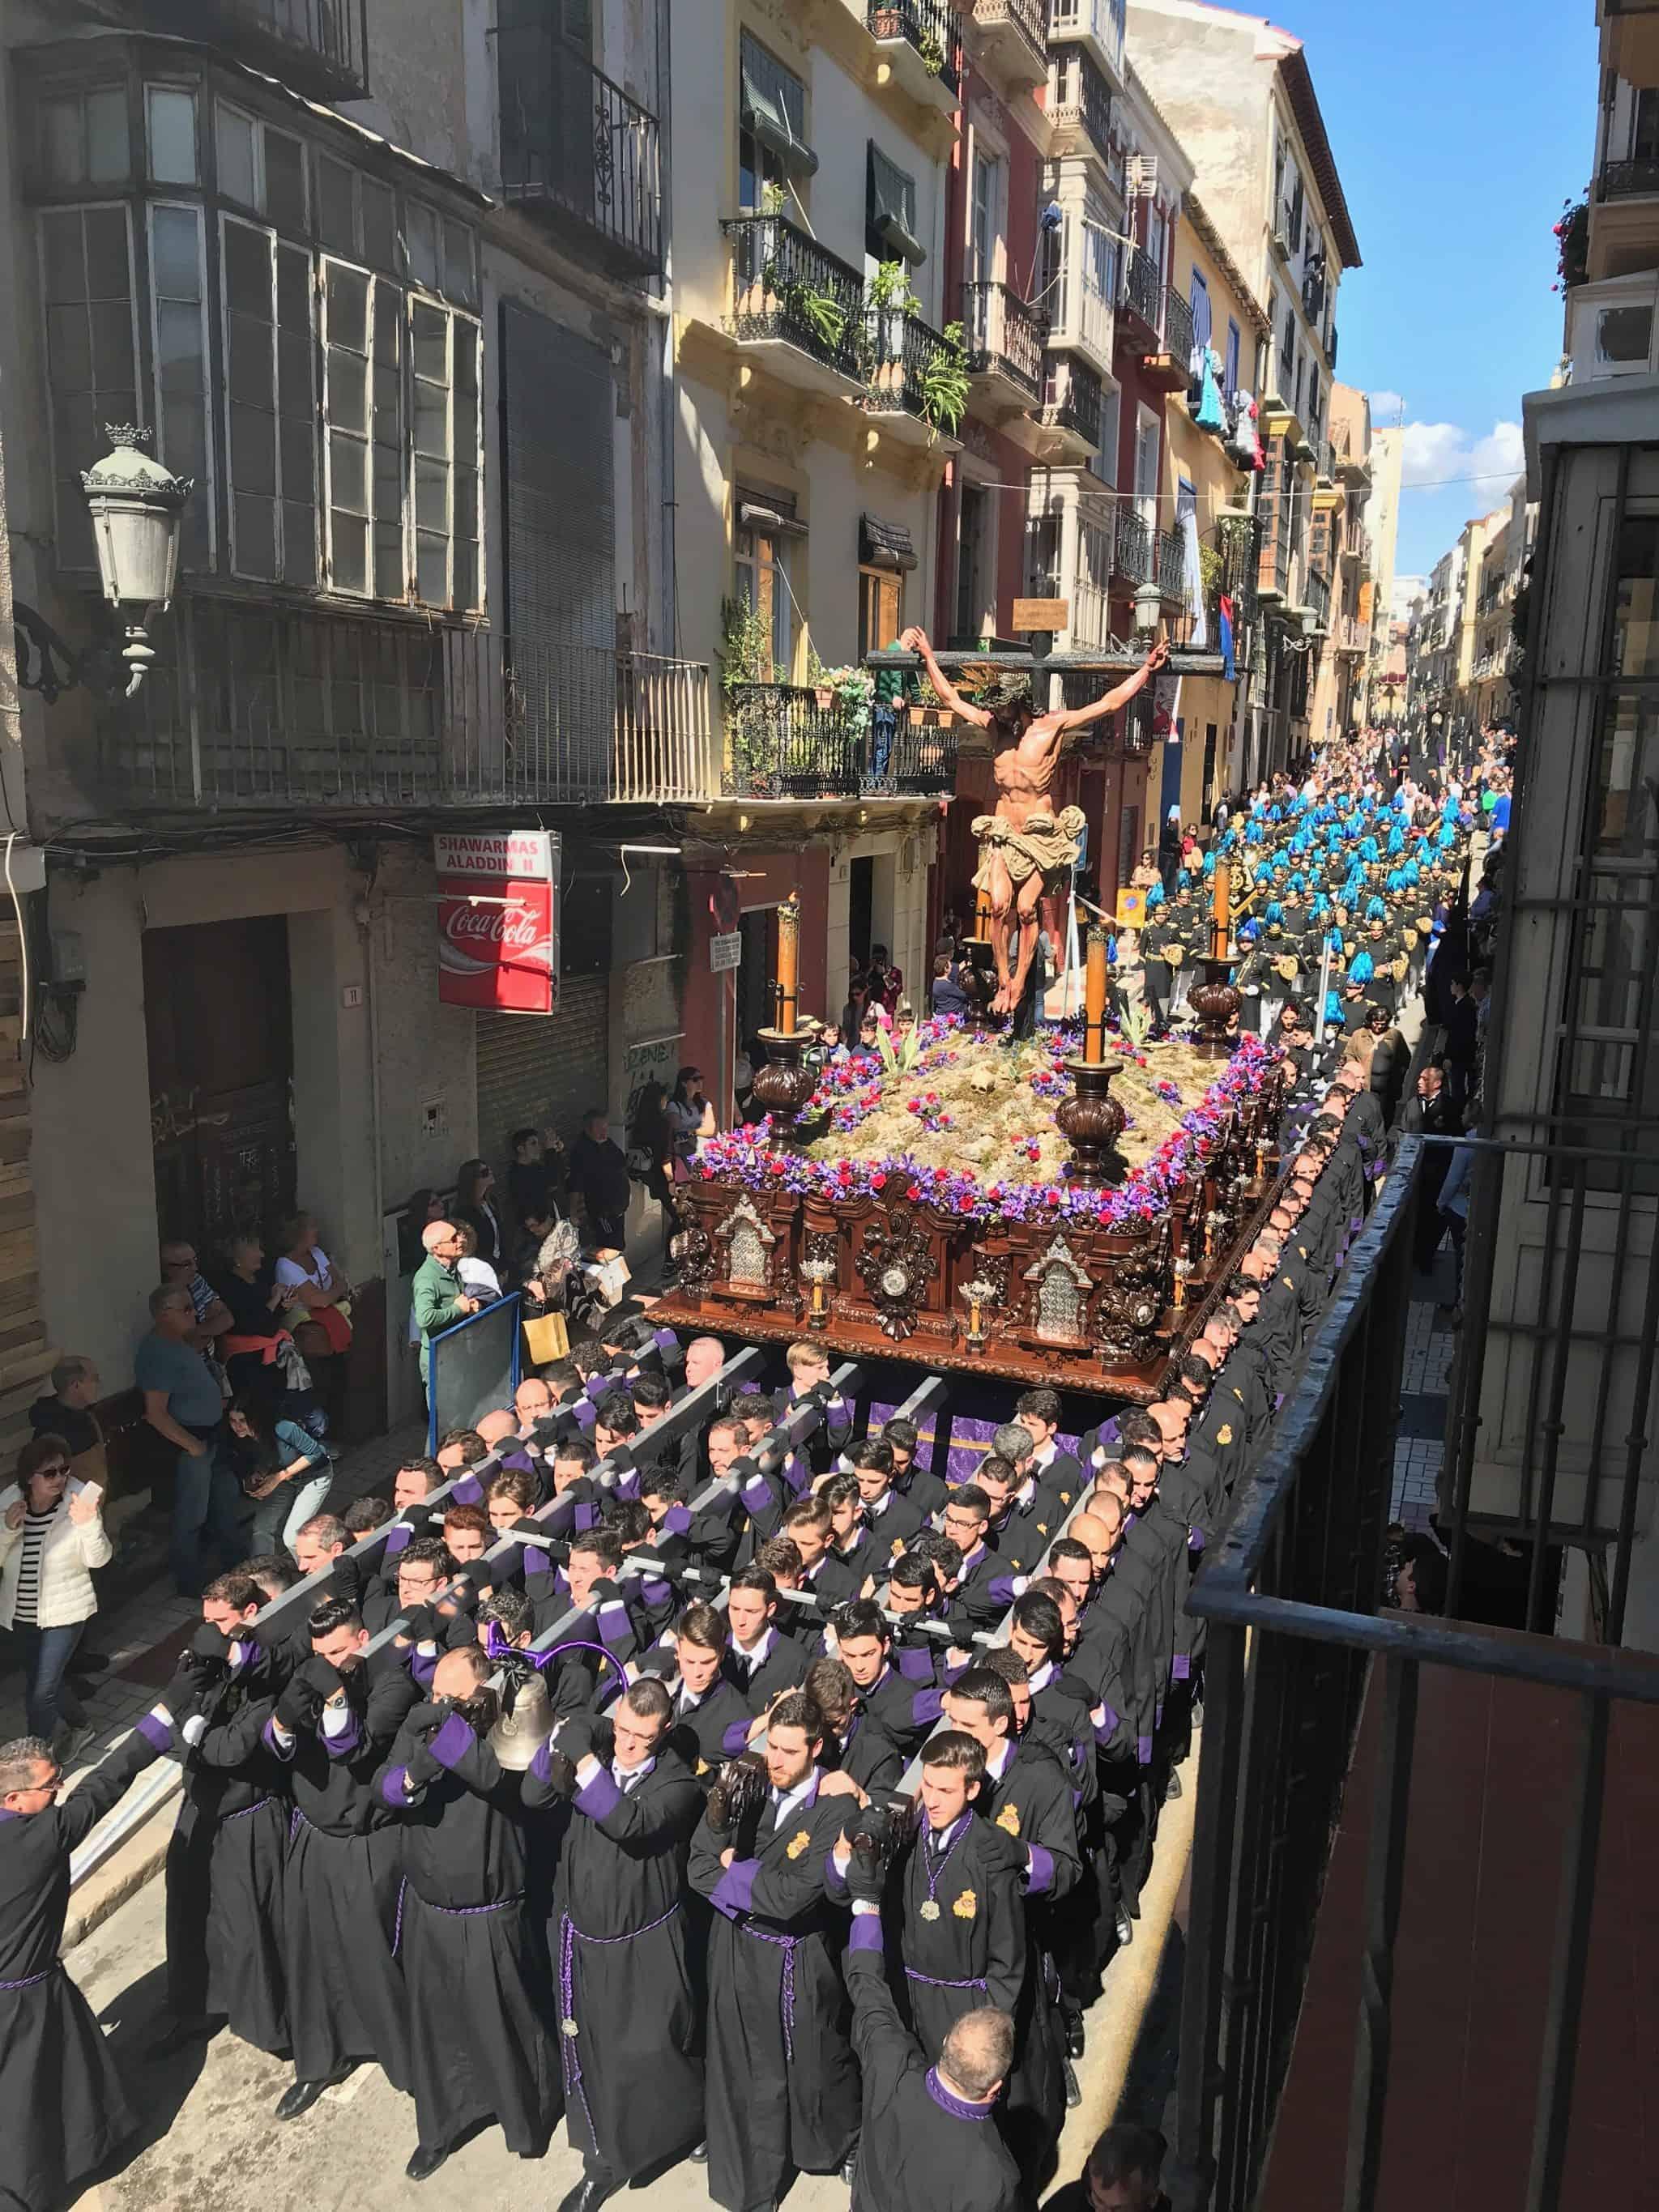 Påskeuken i Malaga, norsk reiseblogg, påskefeiring i Malaga